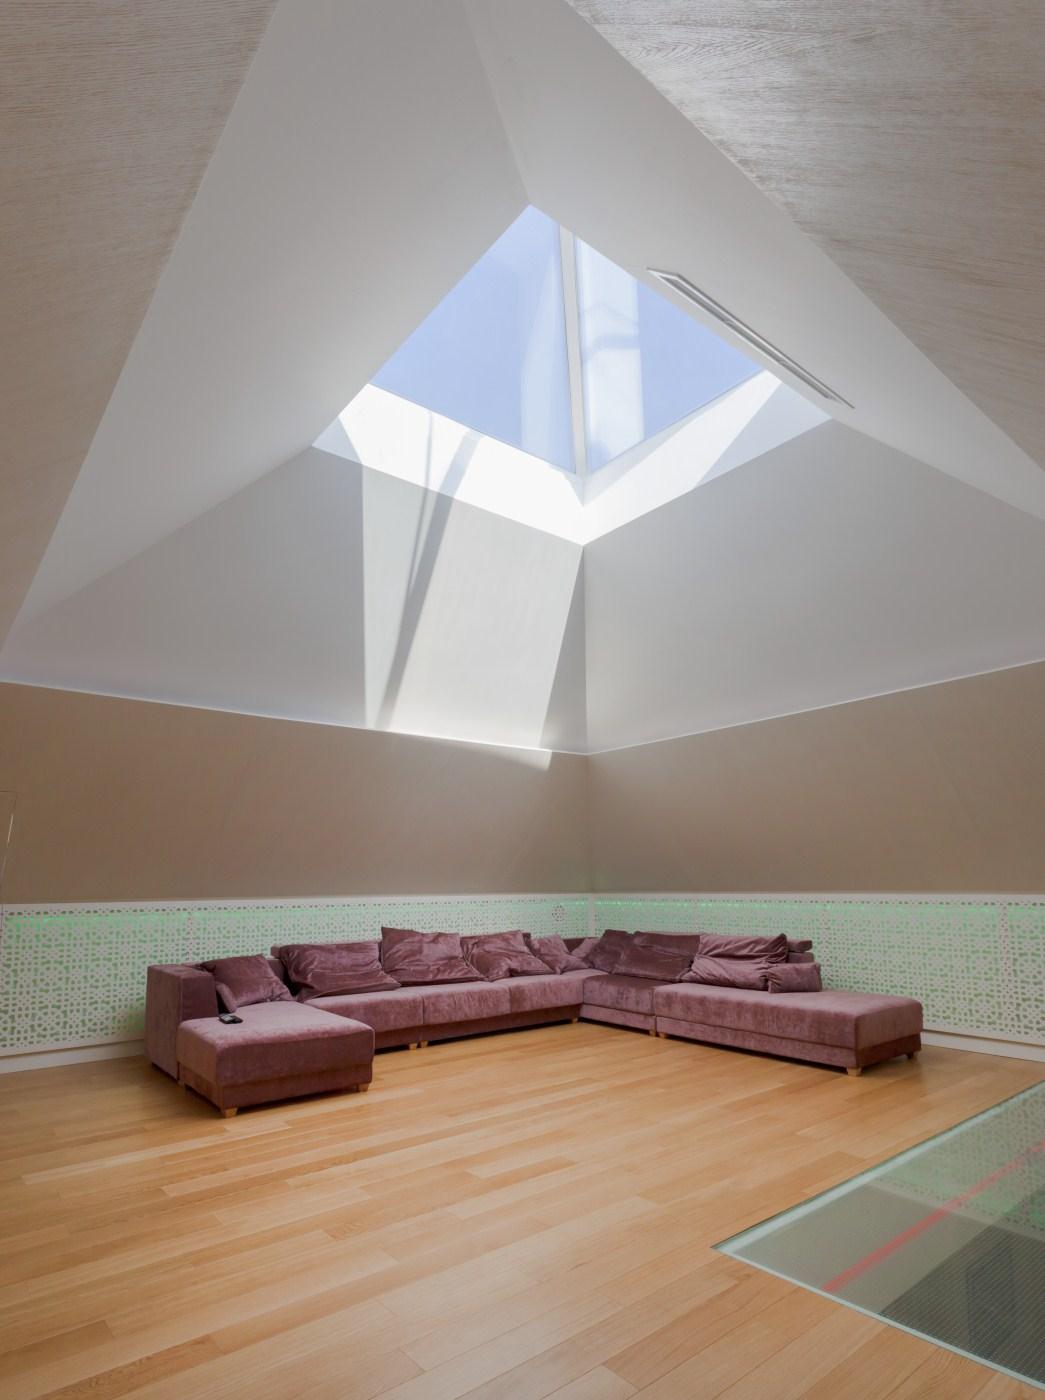 https://nbc-arhitect.ro/wp-content/uploads/2020/10/NBC-Arhitect-_-restorations-_-Washington-House-_-Bucharest-Romania_37.jpg